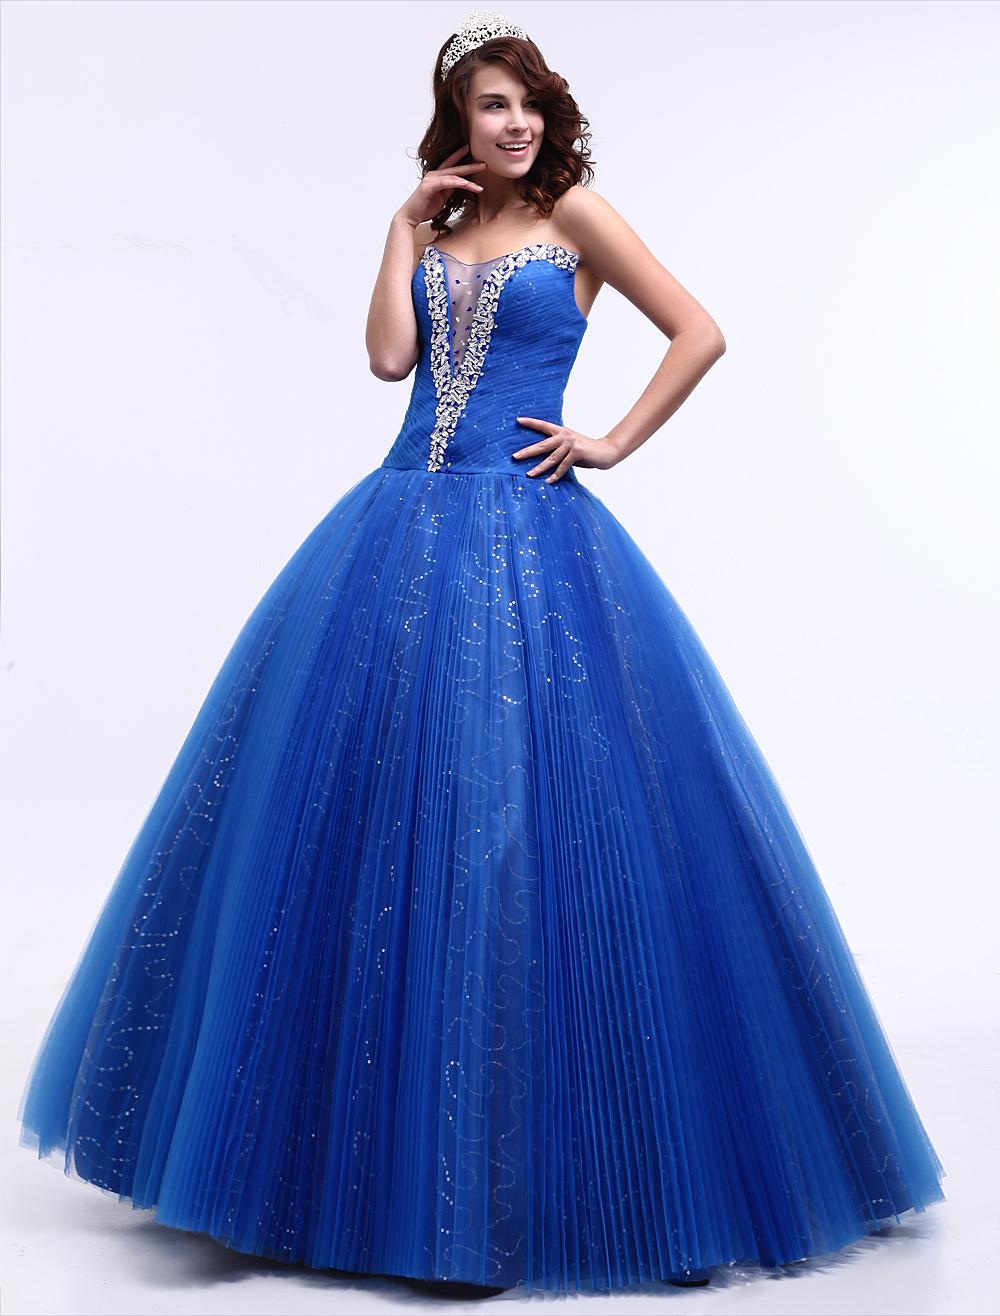 Blue Wedding Dress Sweetheart Floor-Length Ball Gown Princess Bridal Gown Sequin Pageant Dress Milanoo photo